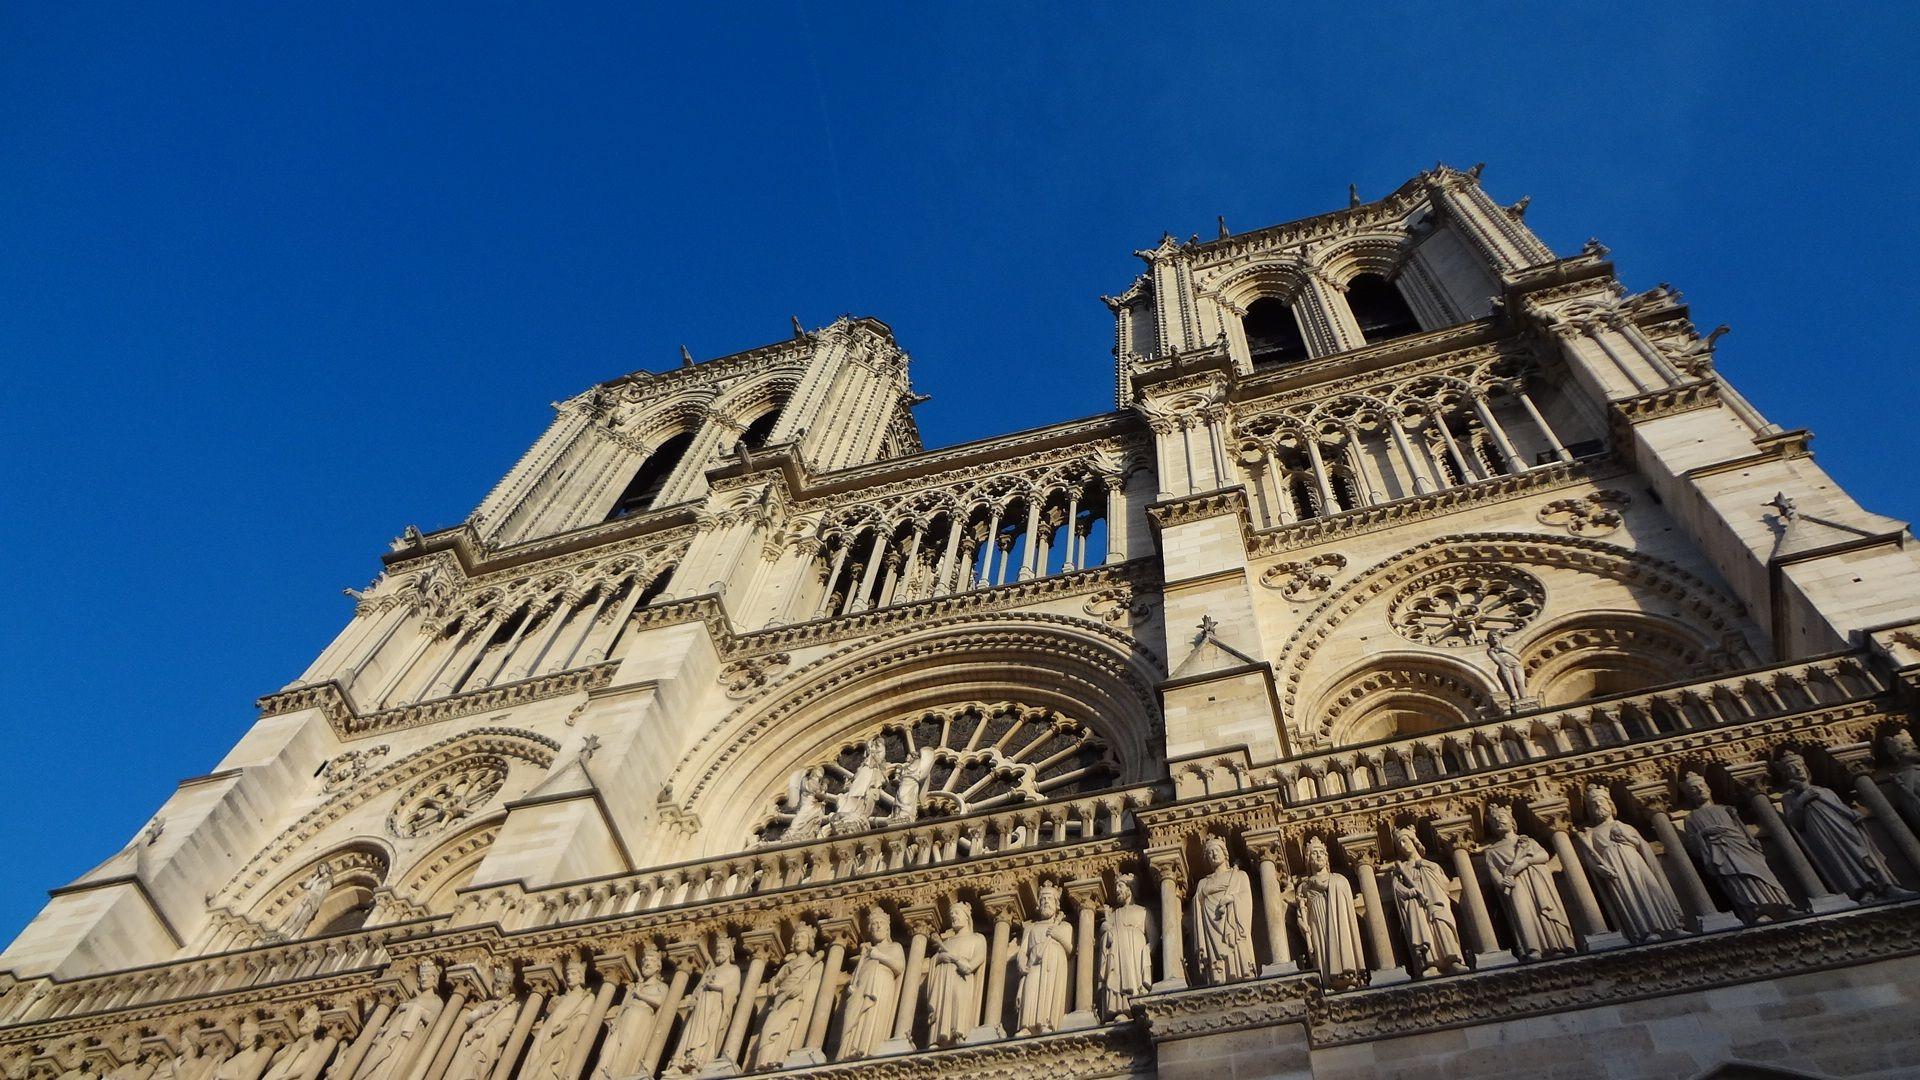 PARIZ Pronađene plinske boce ispred katedrale Notre Dame, dvojica uhićena